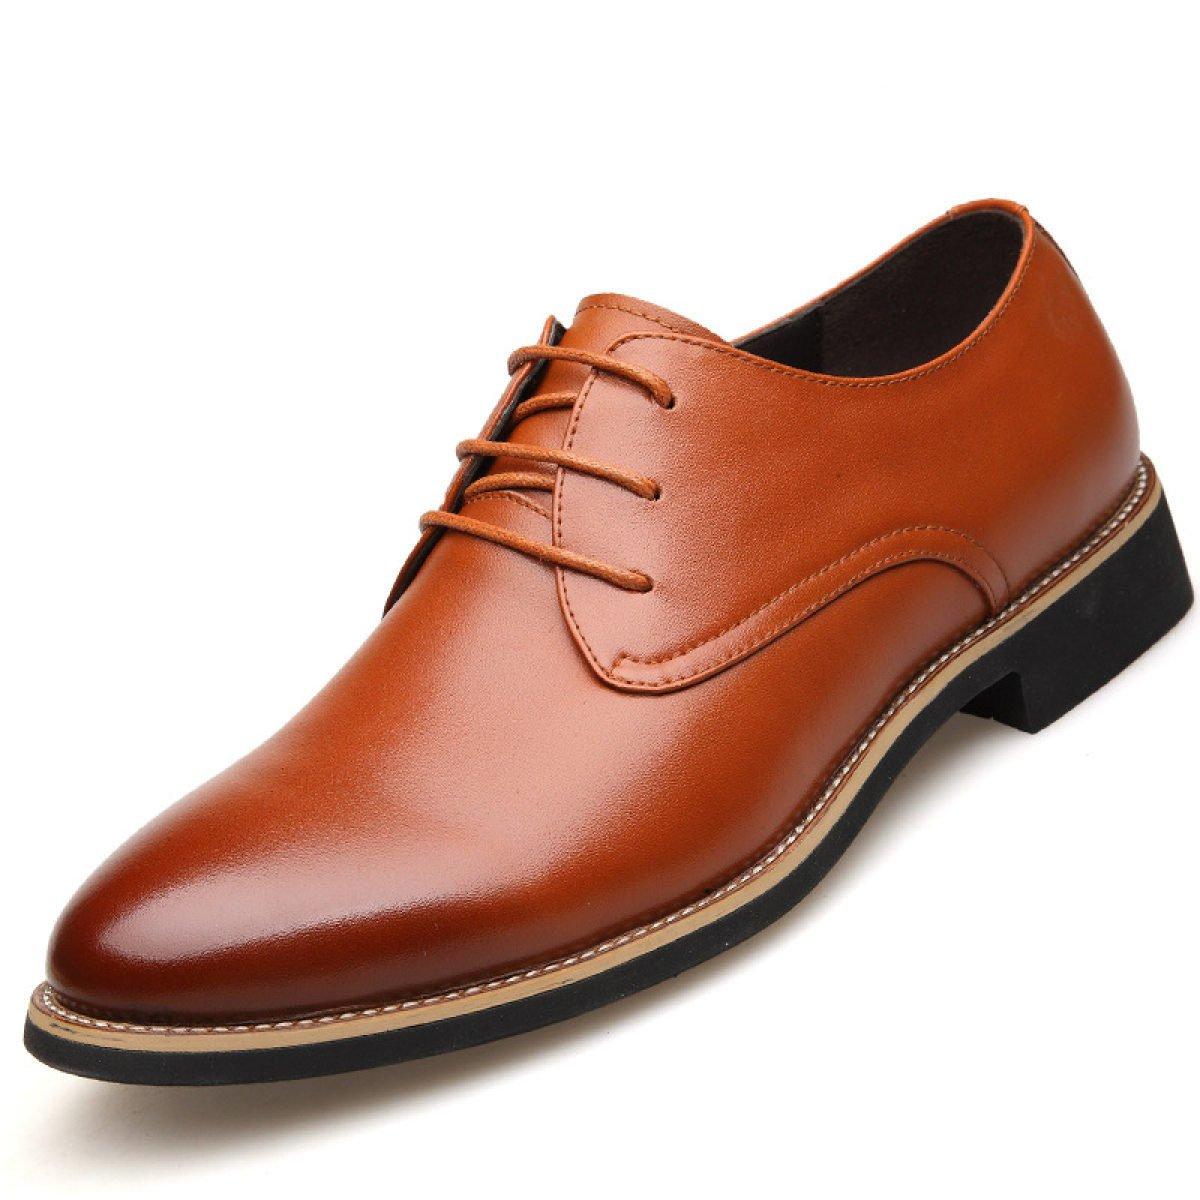 Männer Herbst Business Und Winter Mode Casual Business Herbst Schuhe High-End Hochzeit Schuhe Büro Arbeit Komfort Dads Schuhe Braun2 5617fa